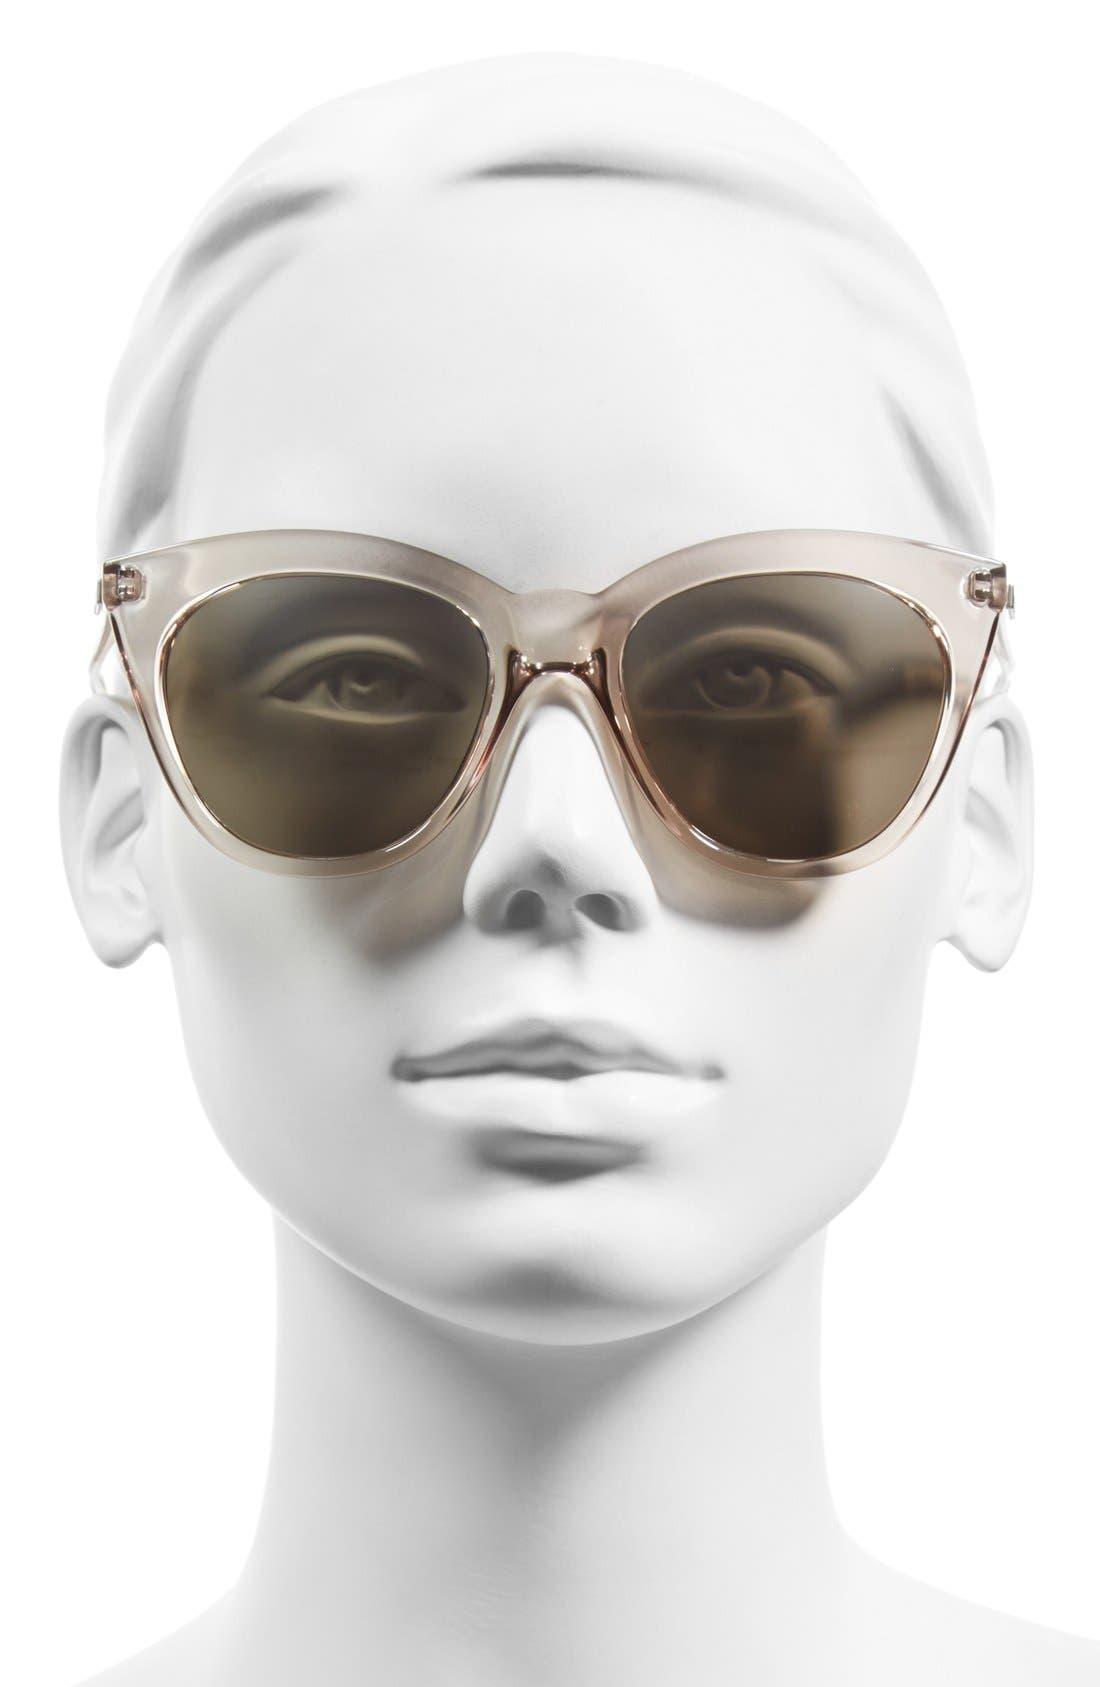 Halfmoon Magic 51mm Cat Eye Sunglasses,                             Alternate thumbnail 2, color,                             STONE/ SILVER MIRROR